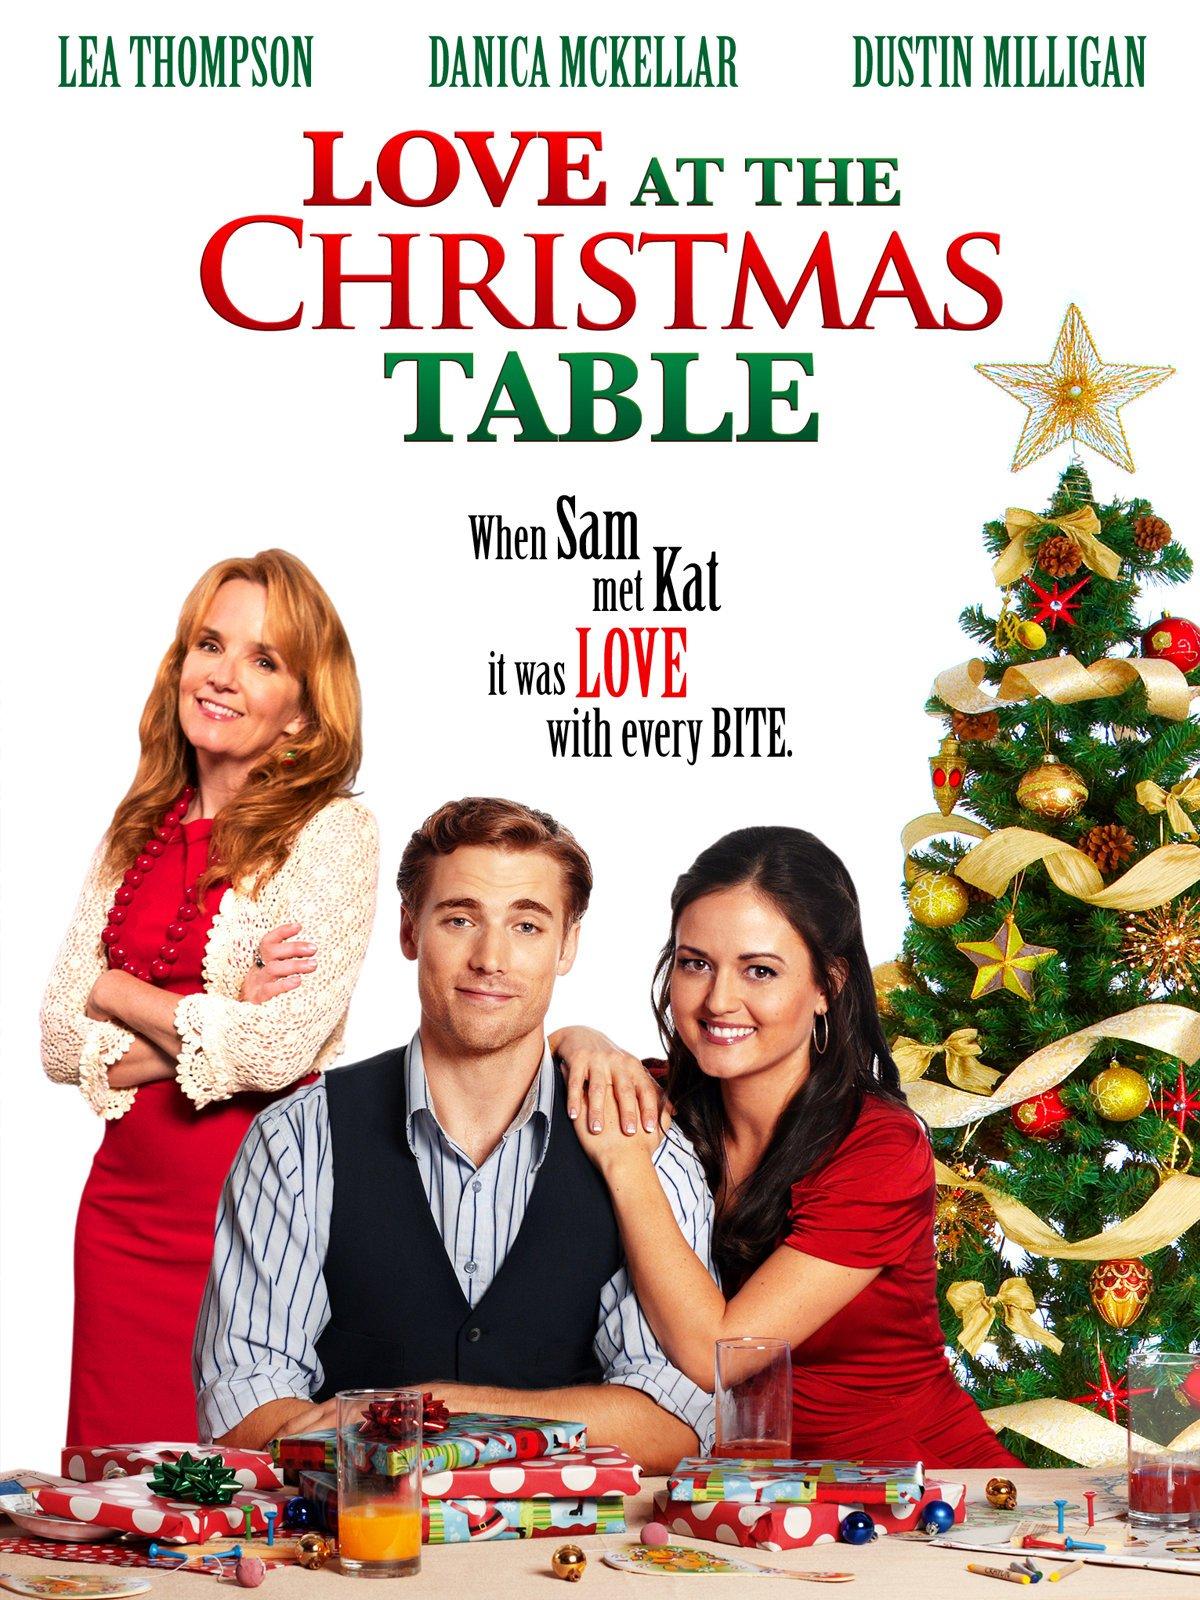 Amazon.com: Love At The Christmas Table: Lea Thompson, Danica ...